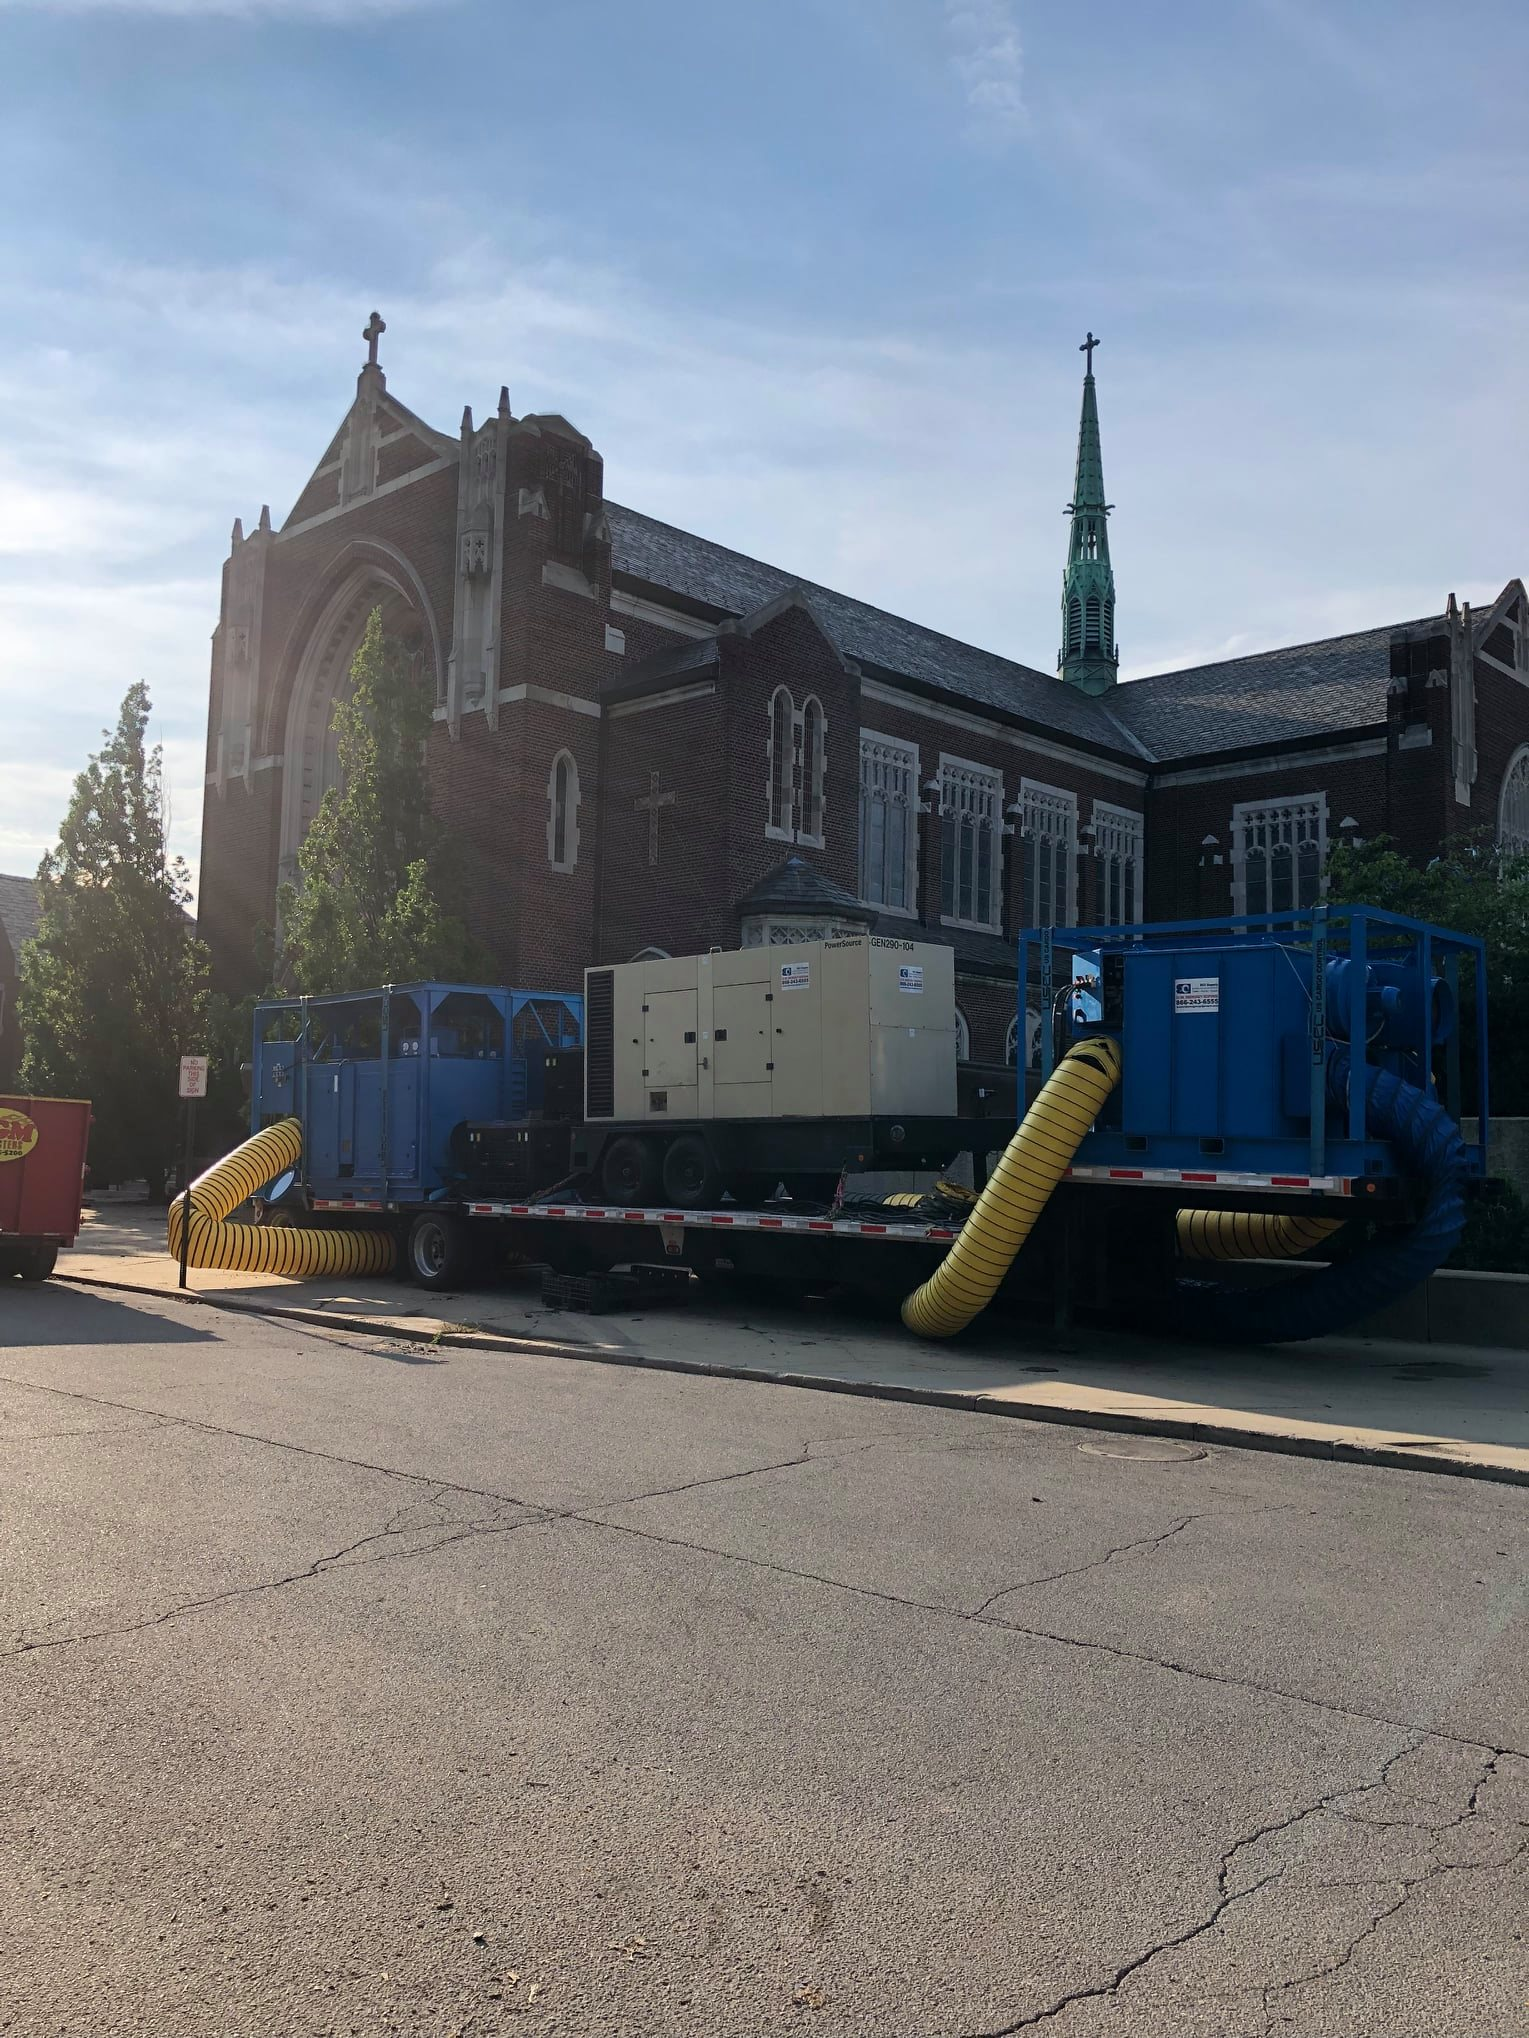 water damage work at a historical church